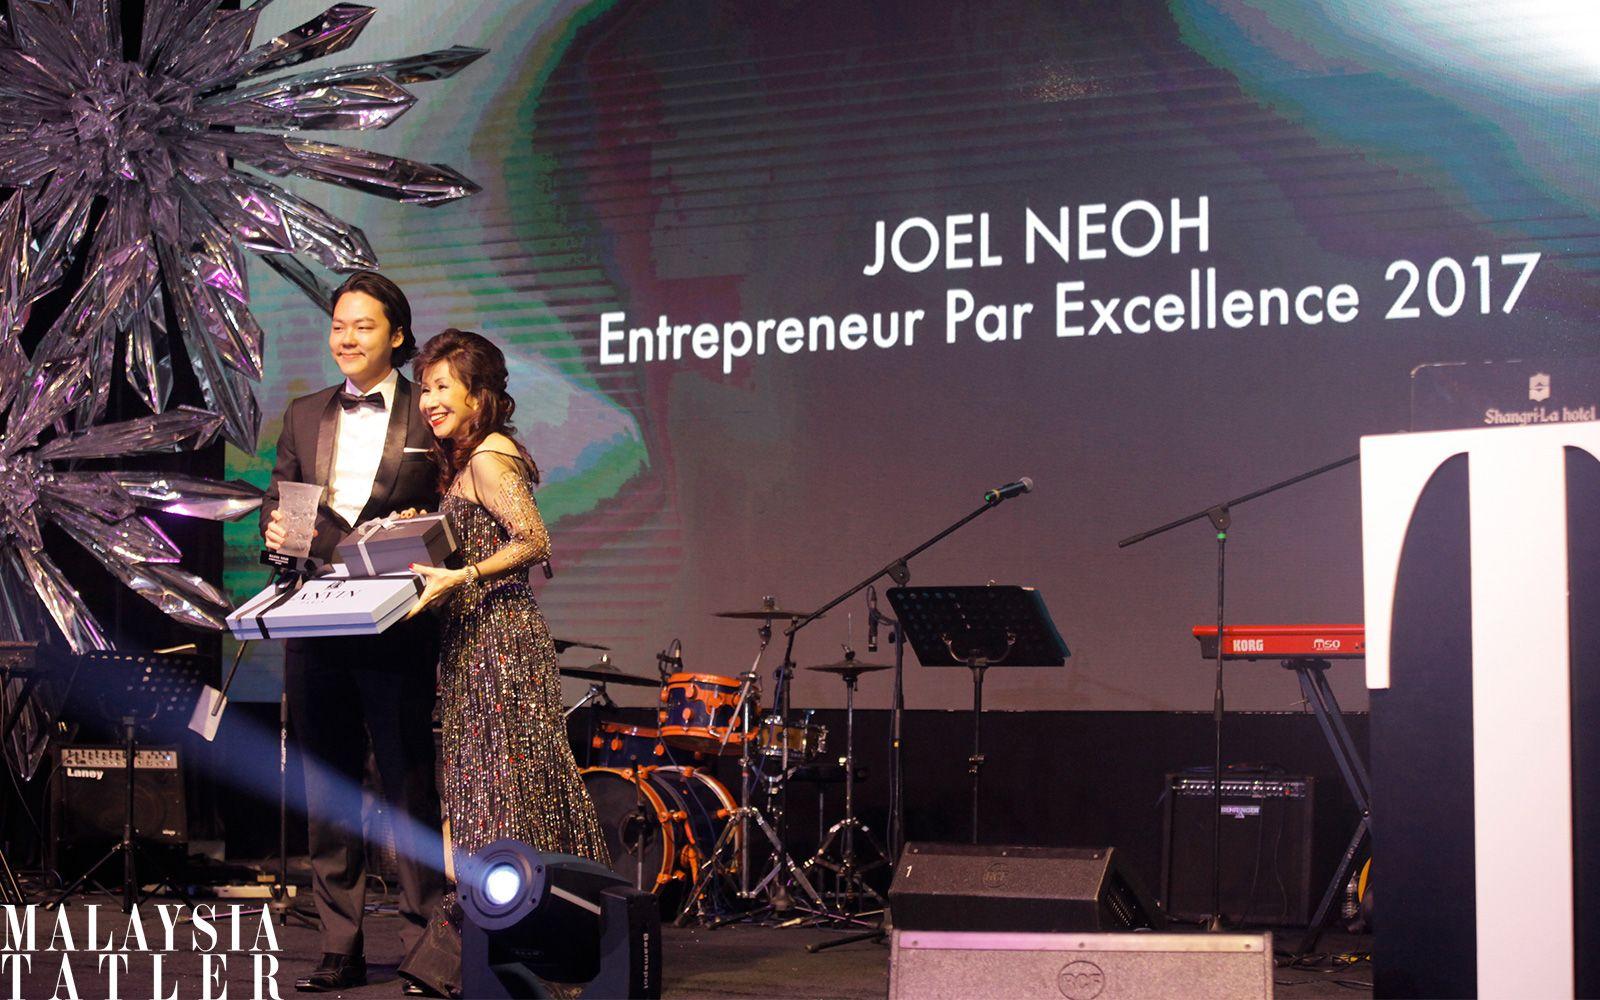 Joel Neoh receiving his award